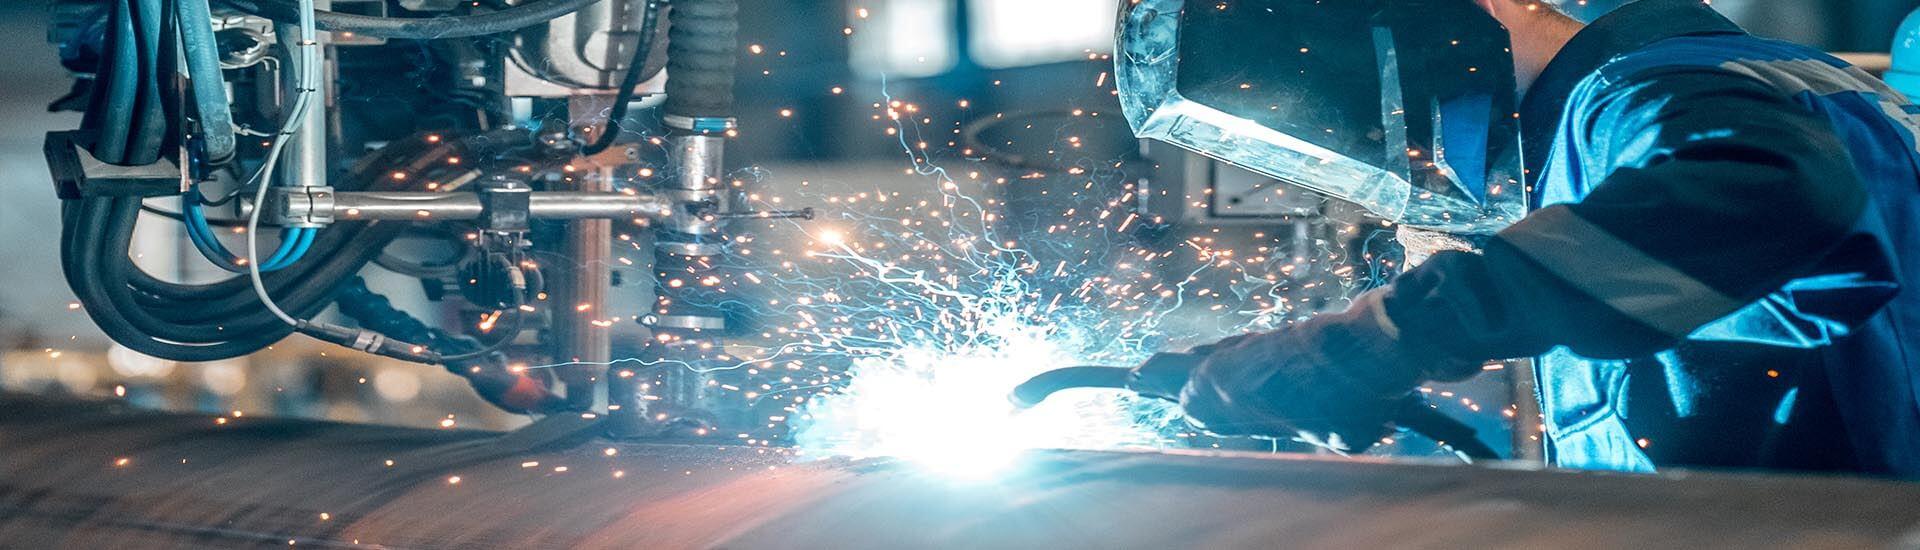 Industrial Jobs in Mansfield